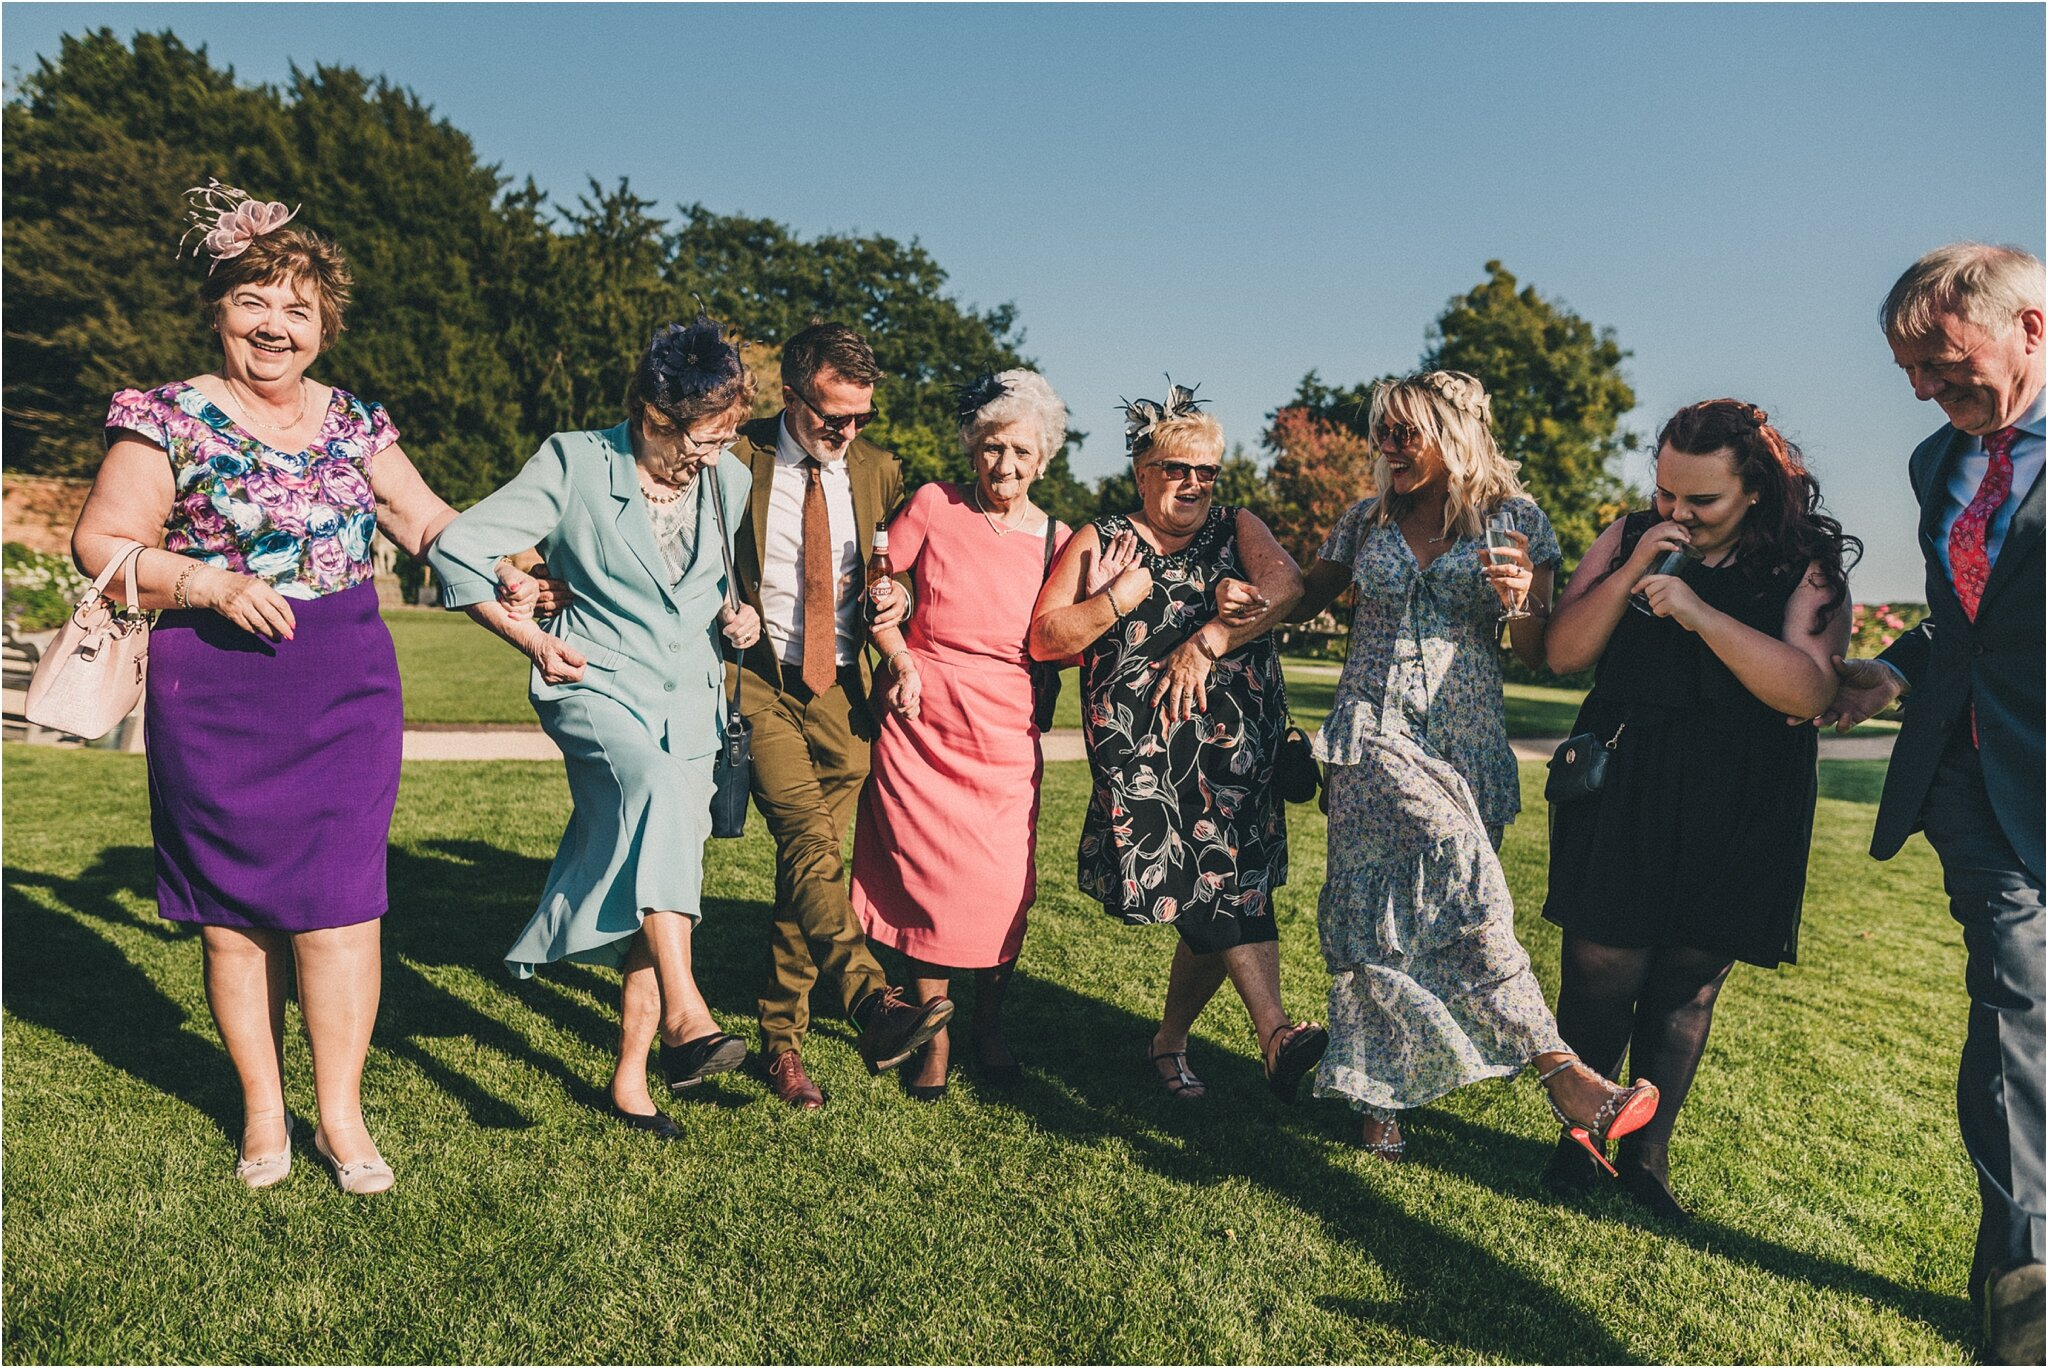 Dorfold Hall marquee wedding 00049.jpg